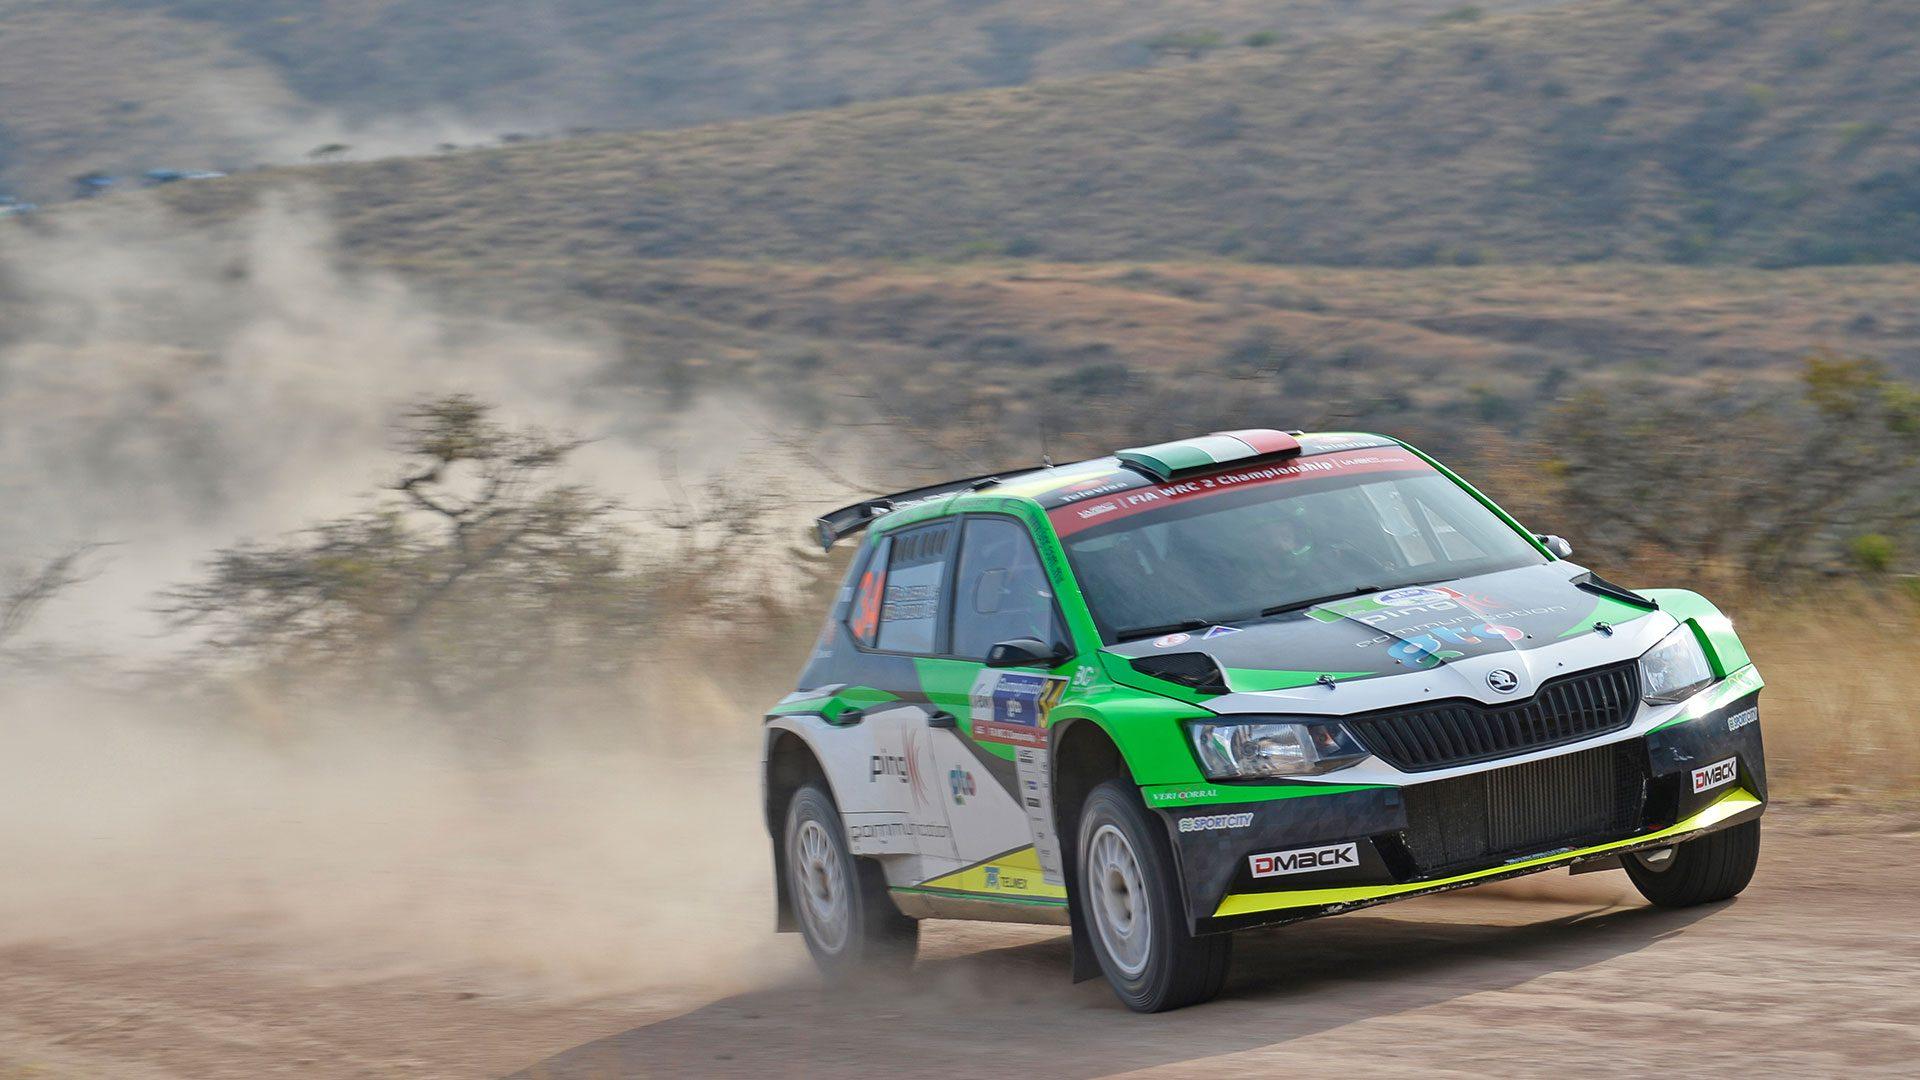 Benito Guerra jr. / Borja Rozada, ŠKODA FABIA R5, Motorsport Italia. Rally Guanajuato Mexico 2017